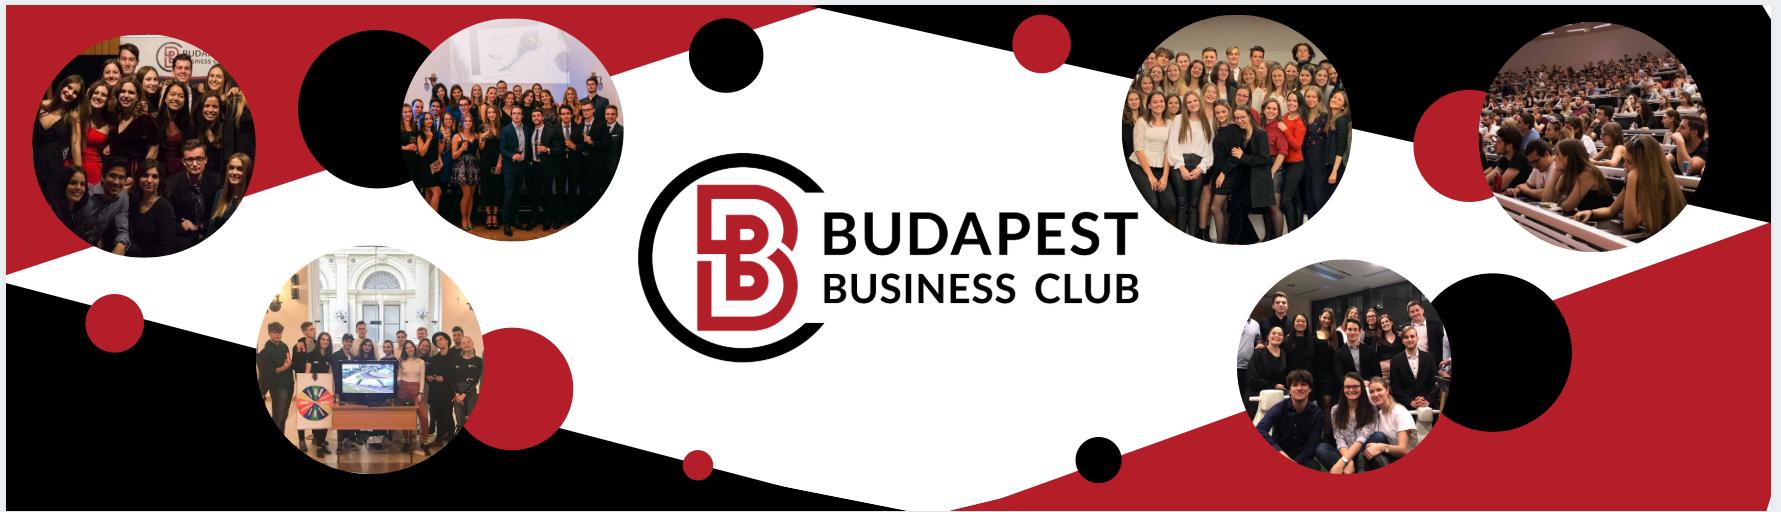 Budapest business club